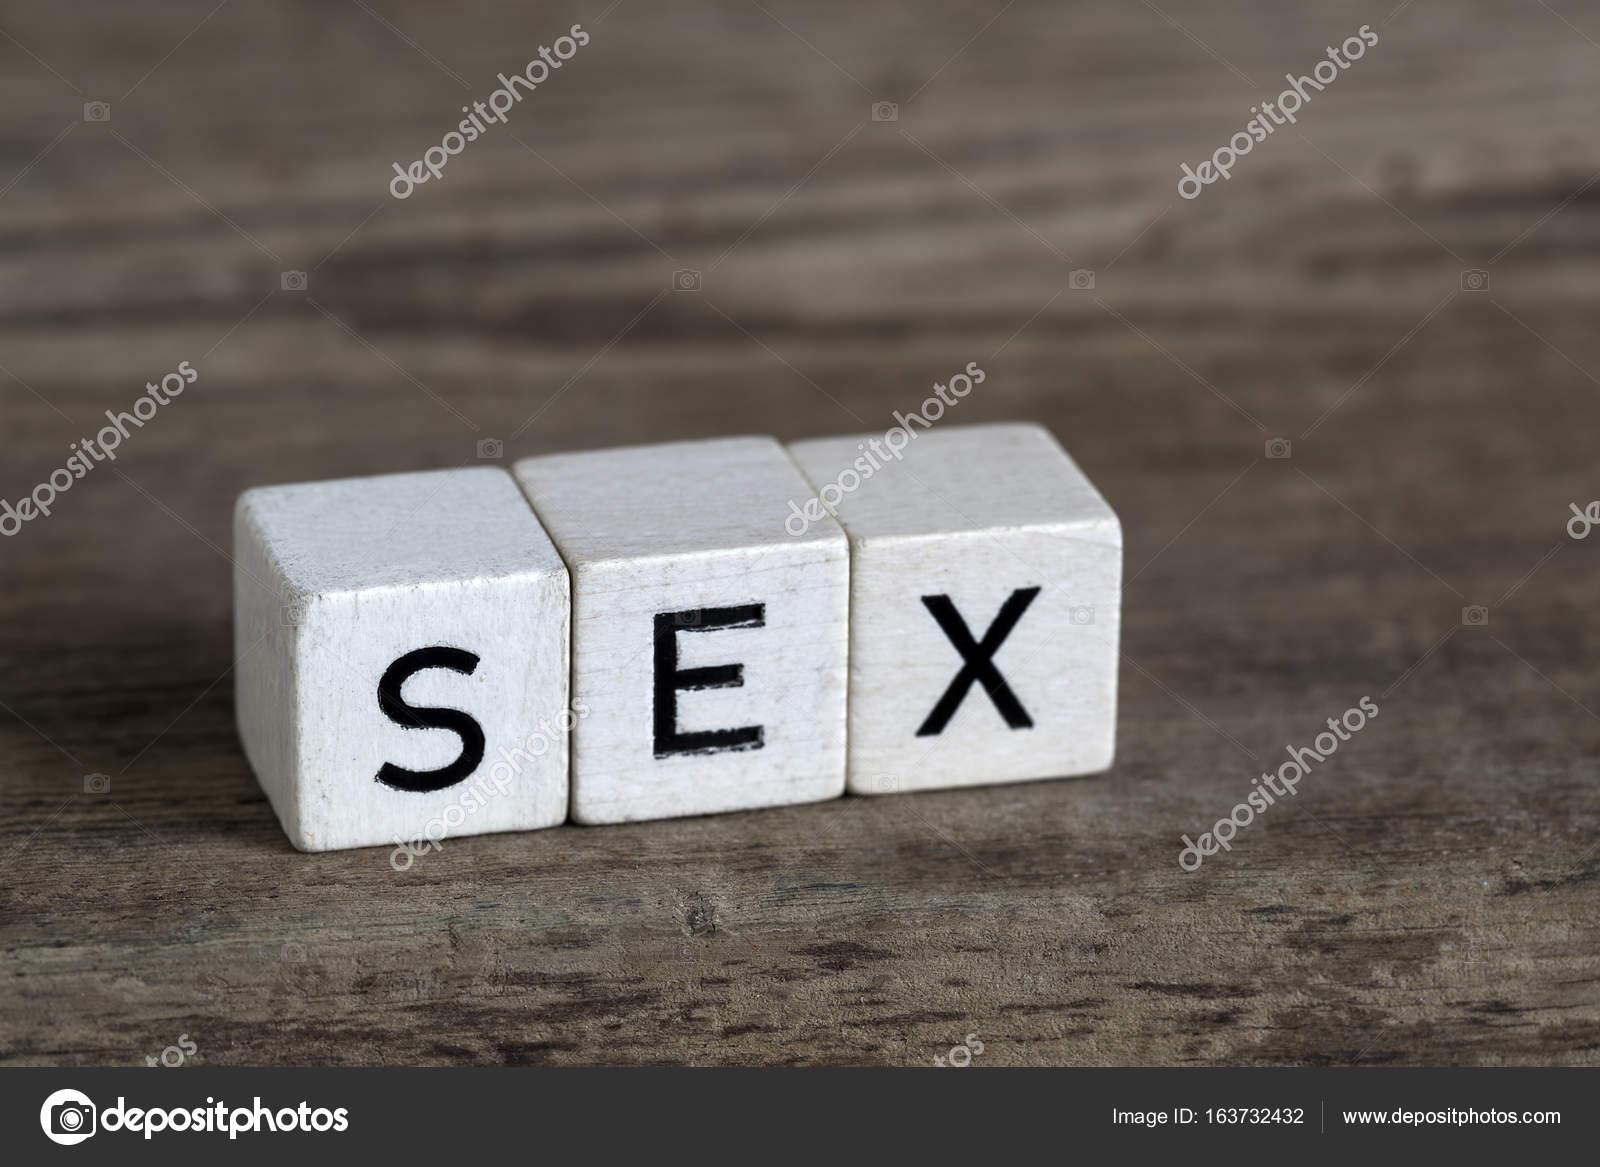 sex kb